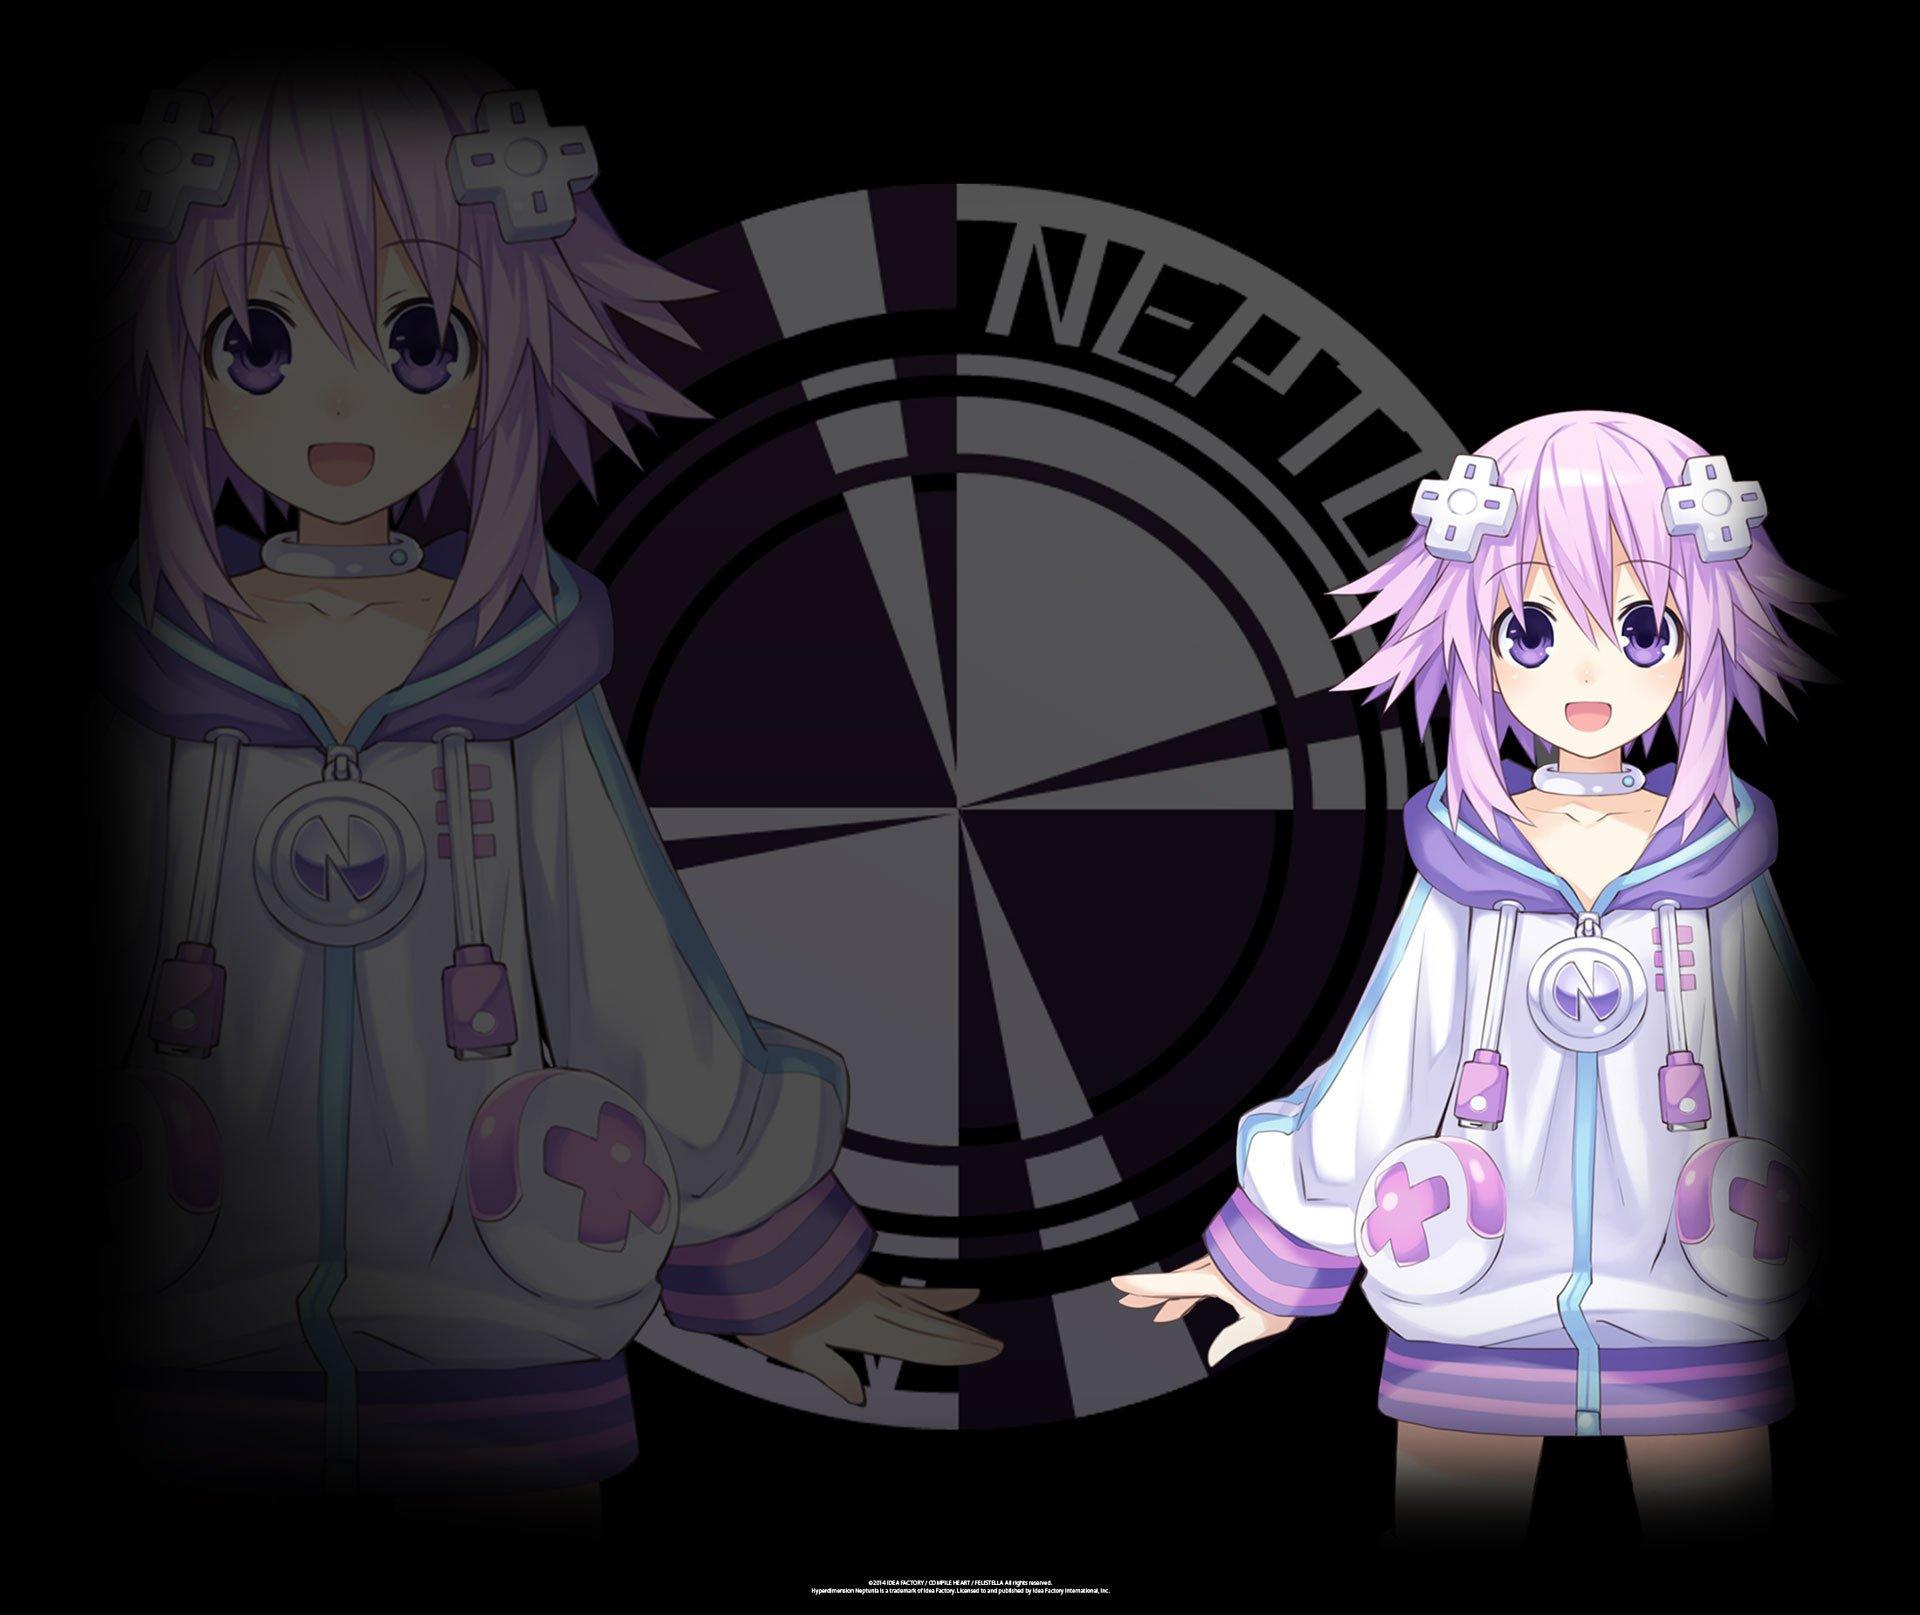 6 Hyperdimension Neptunia Re Birth1 Hd Wallpapers Background